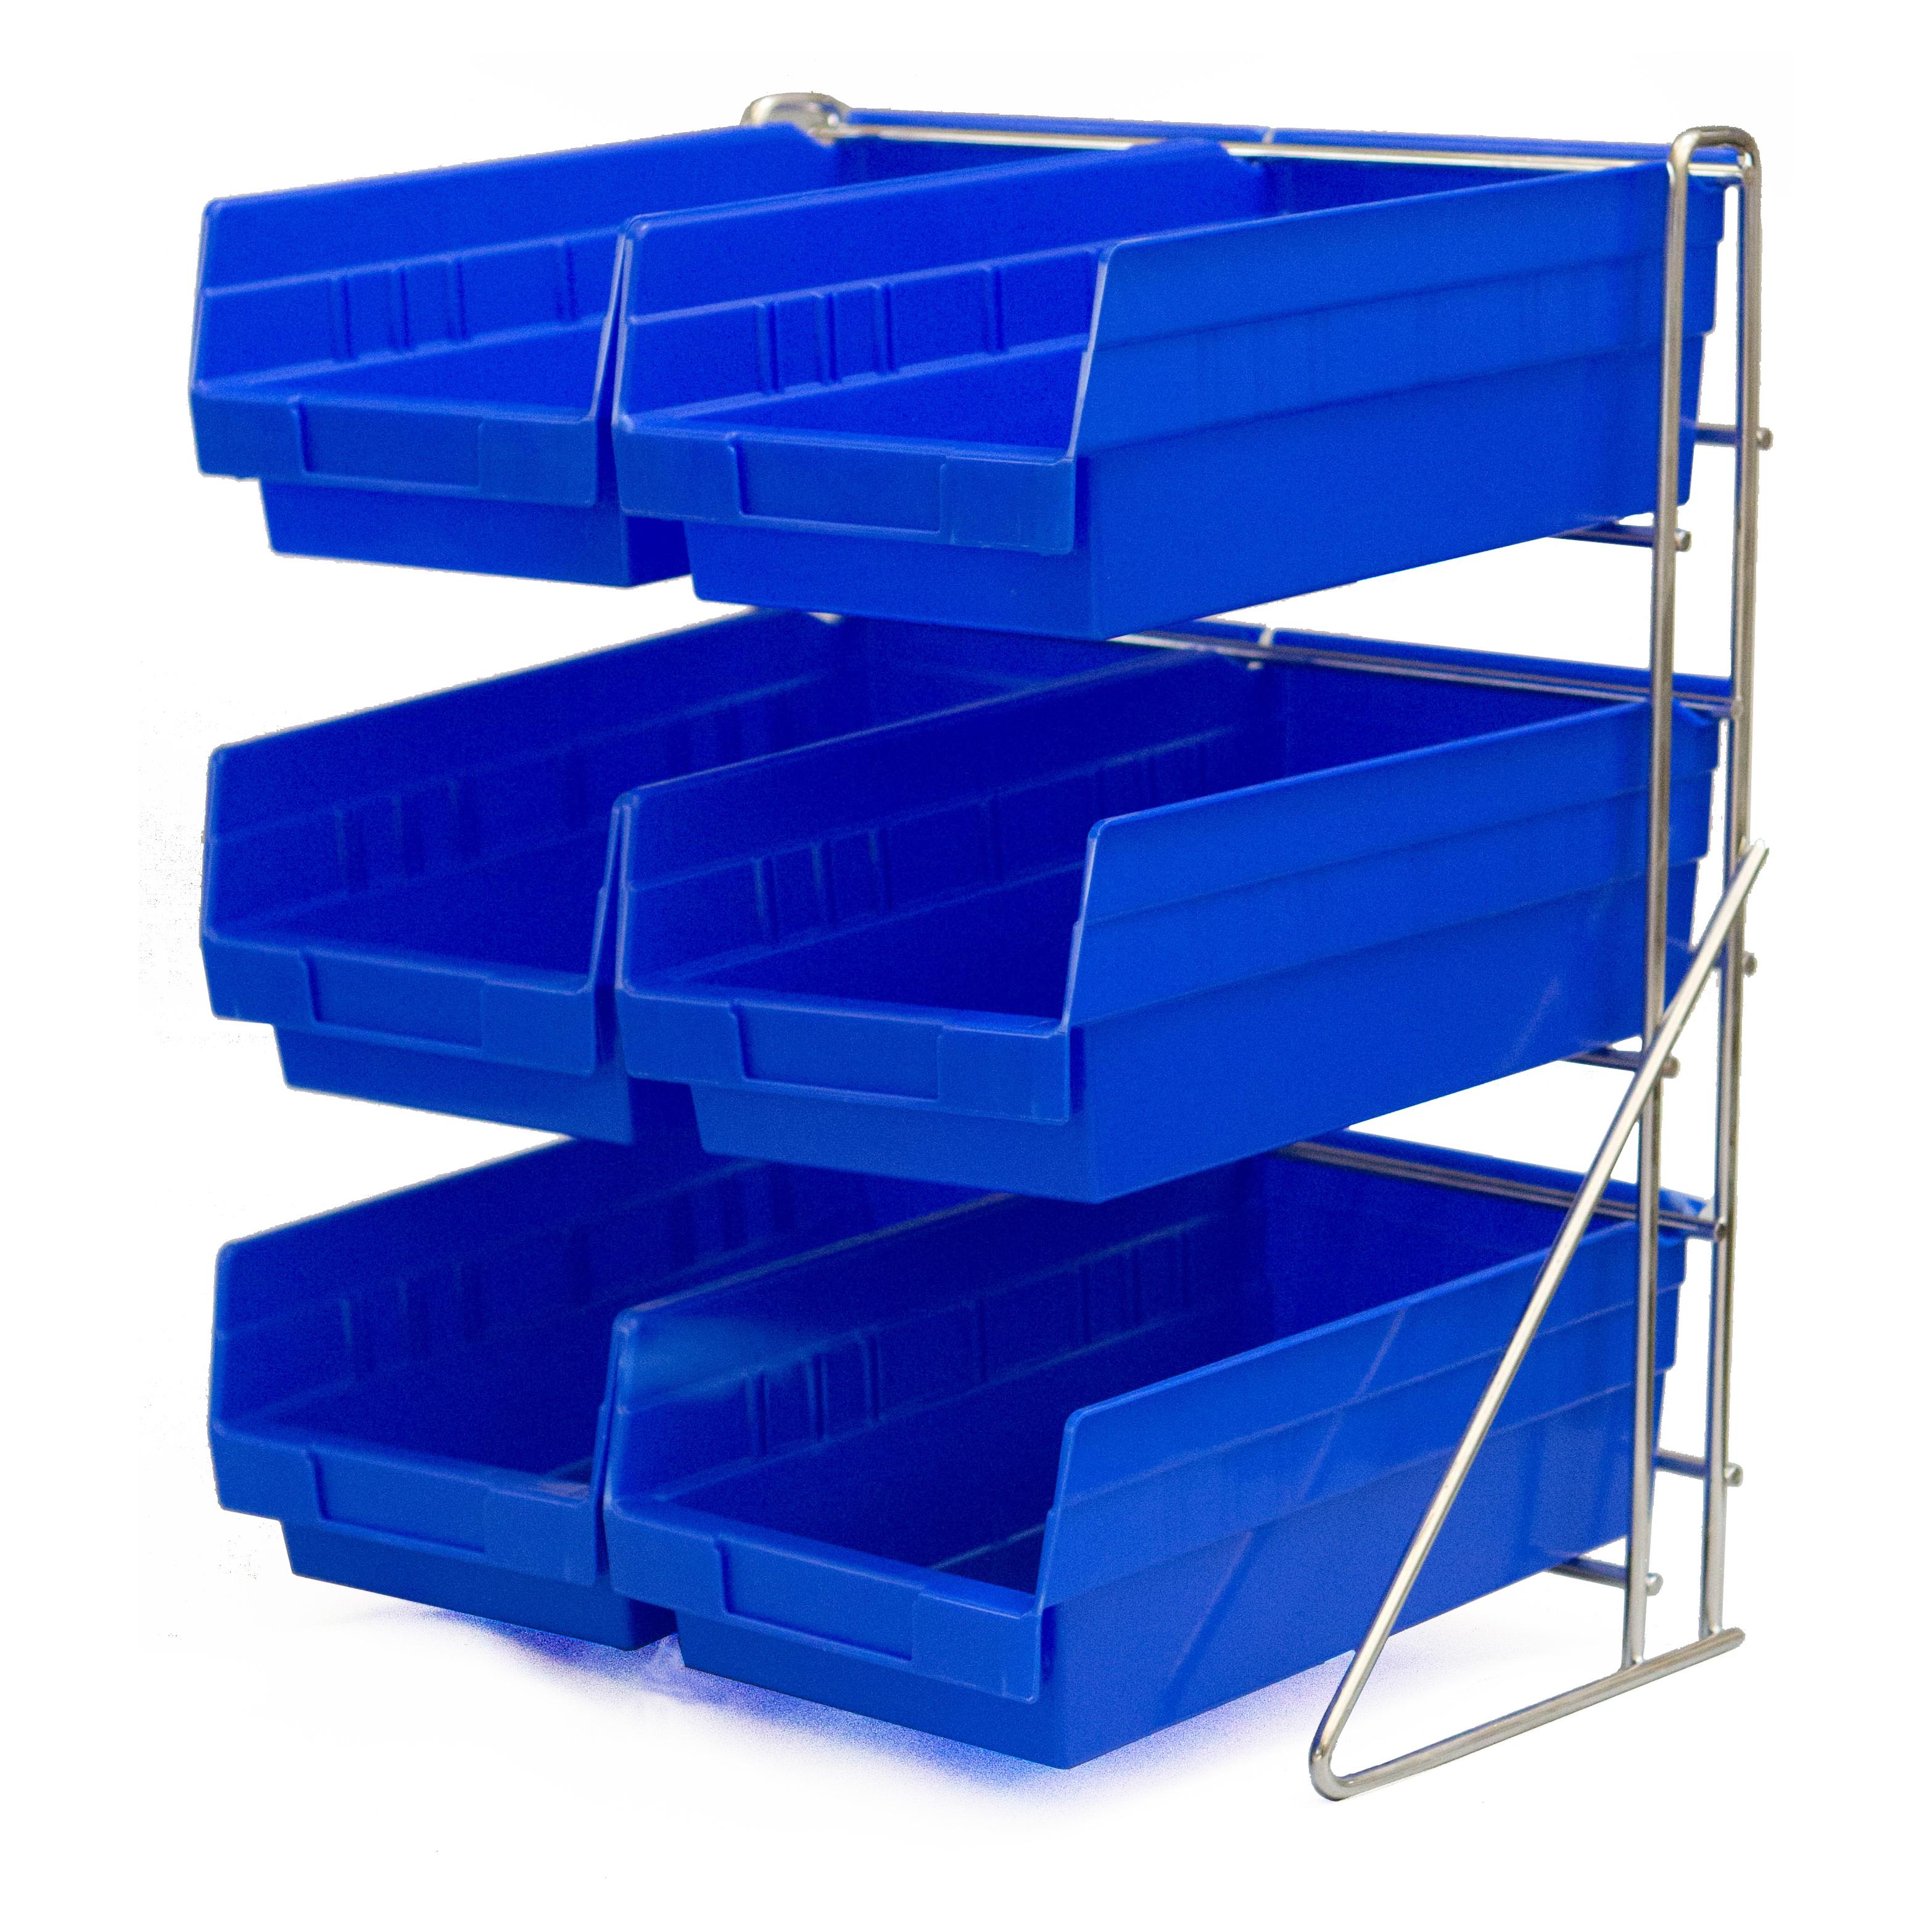 Carlisle 381206LG condiment organizer bin rack